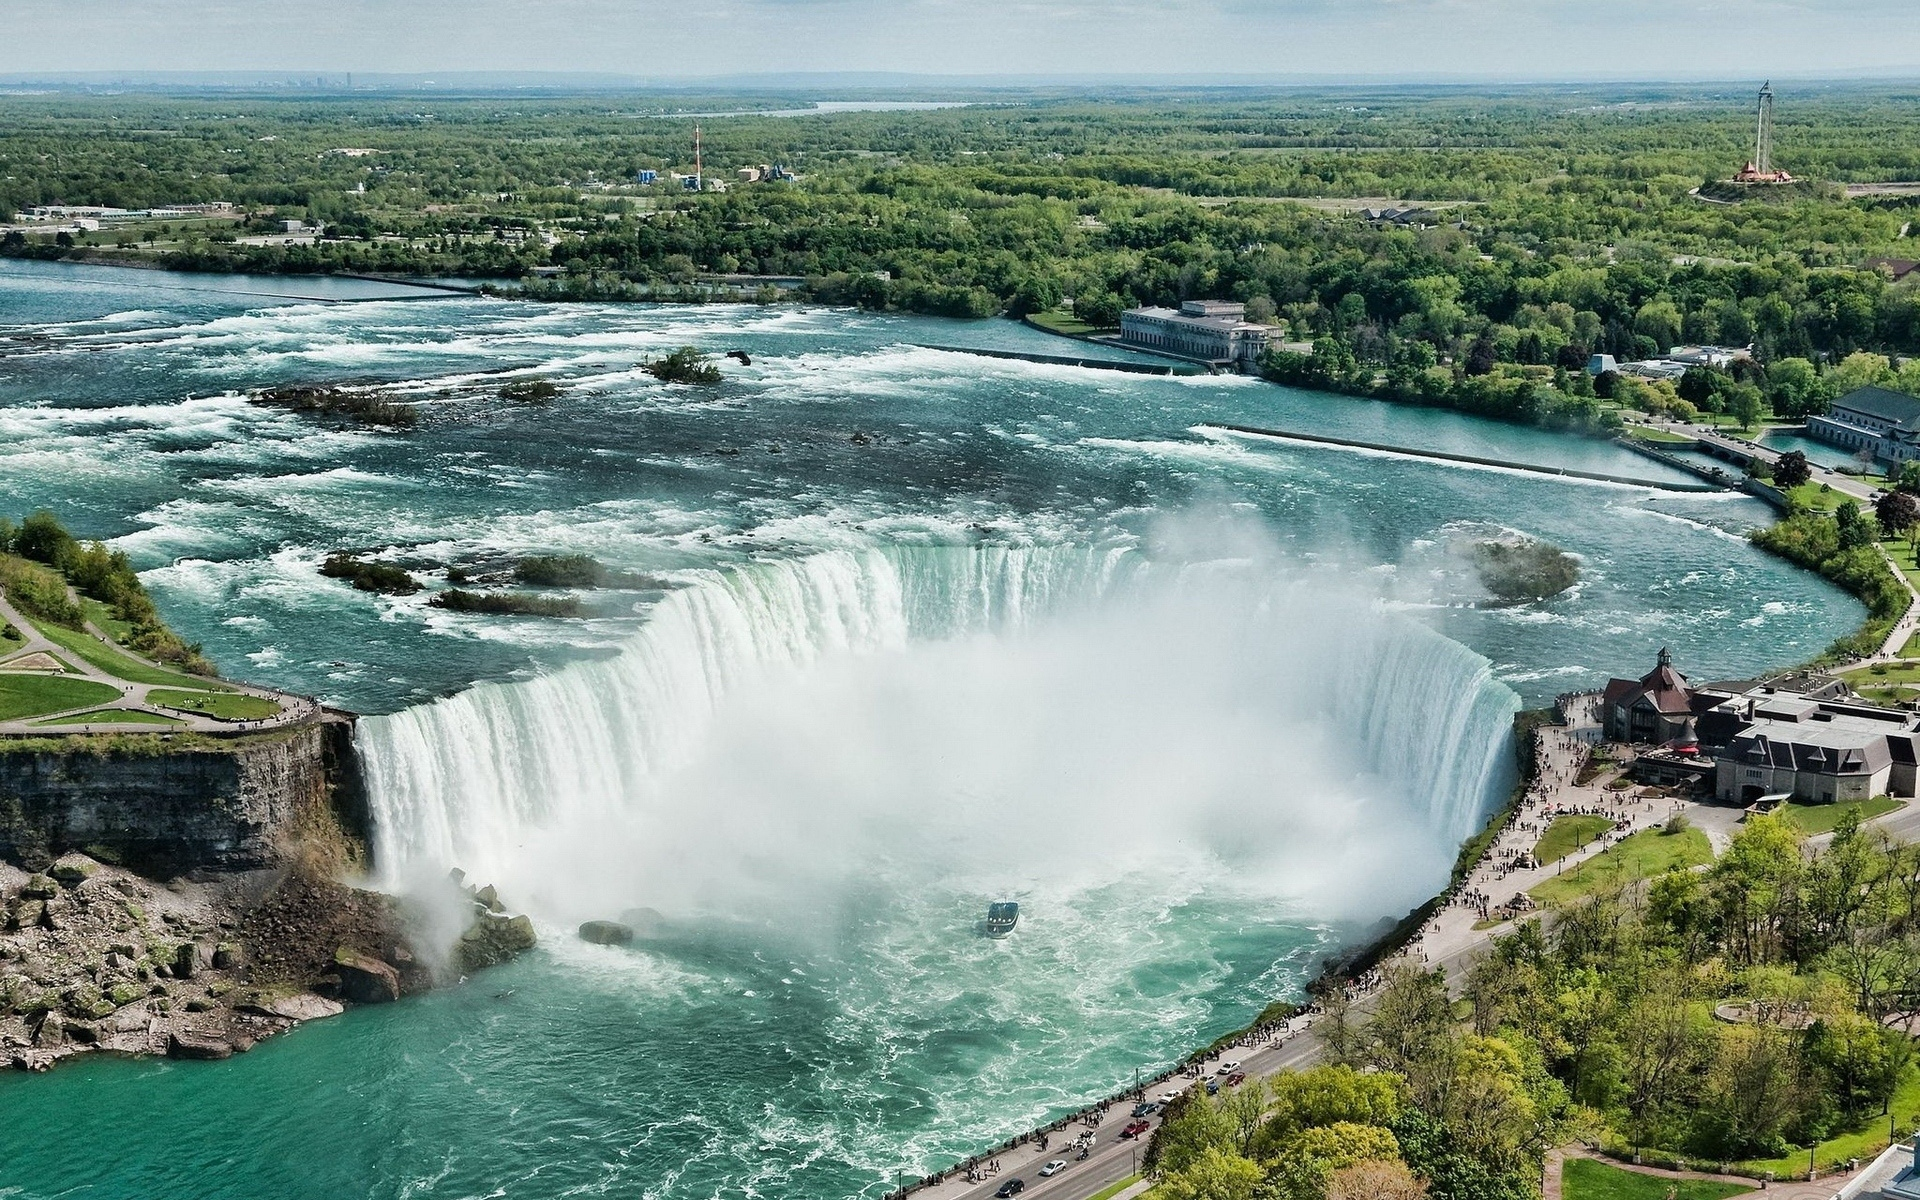 Hd Niagara Falls Wallpaper Niagara Falls Hd Wallpaper Background Image 1920x1200